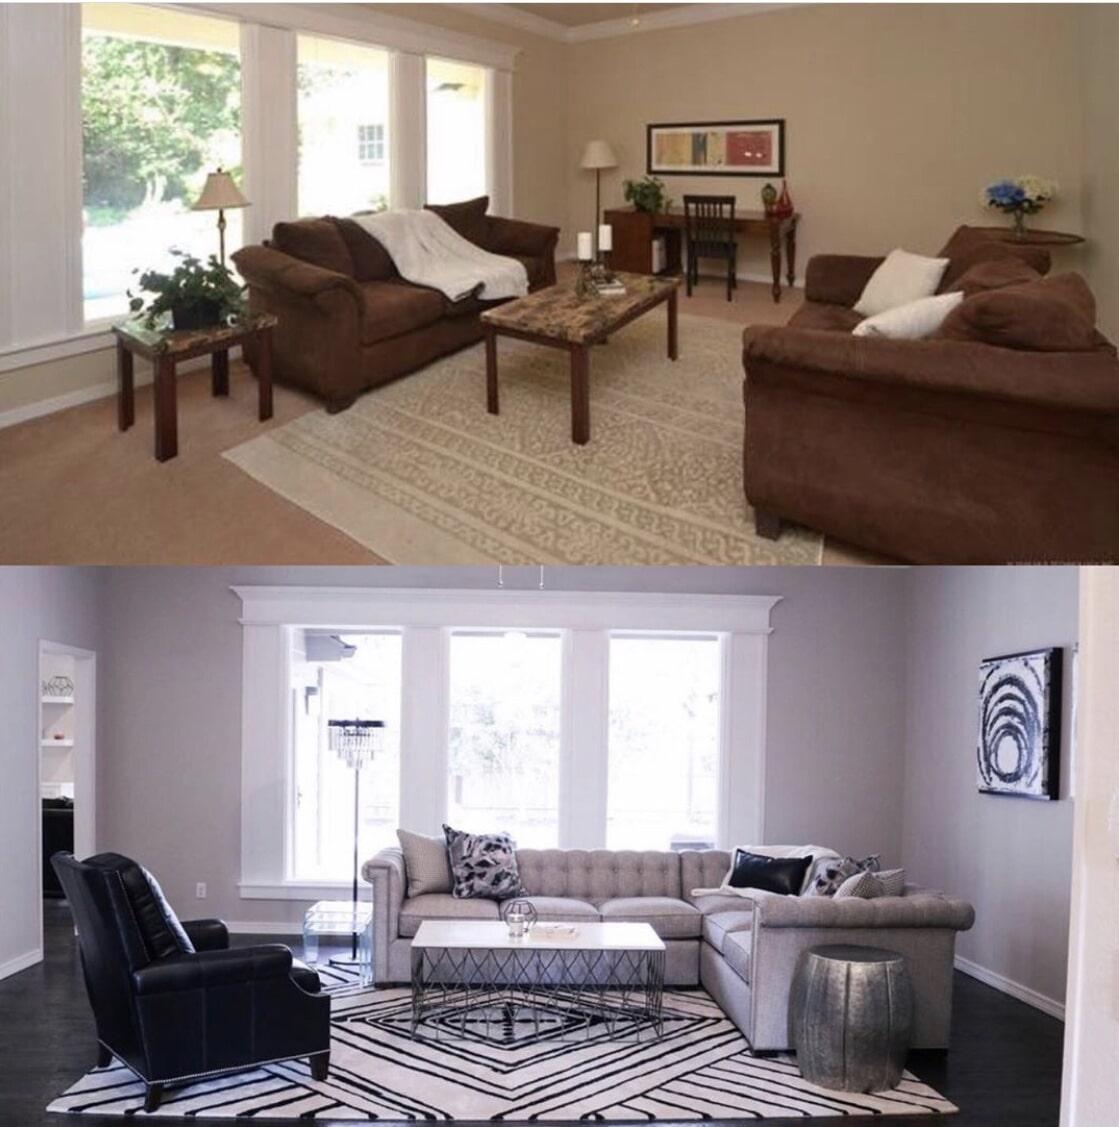 Livingroom remodel in Tulsa, OK from Superior Wood Floors & Tile